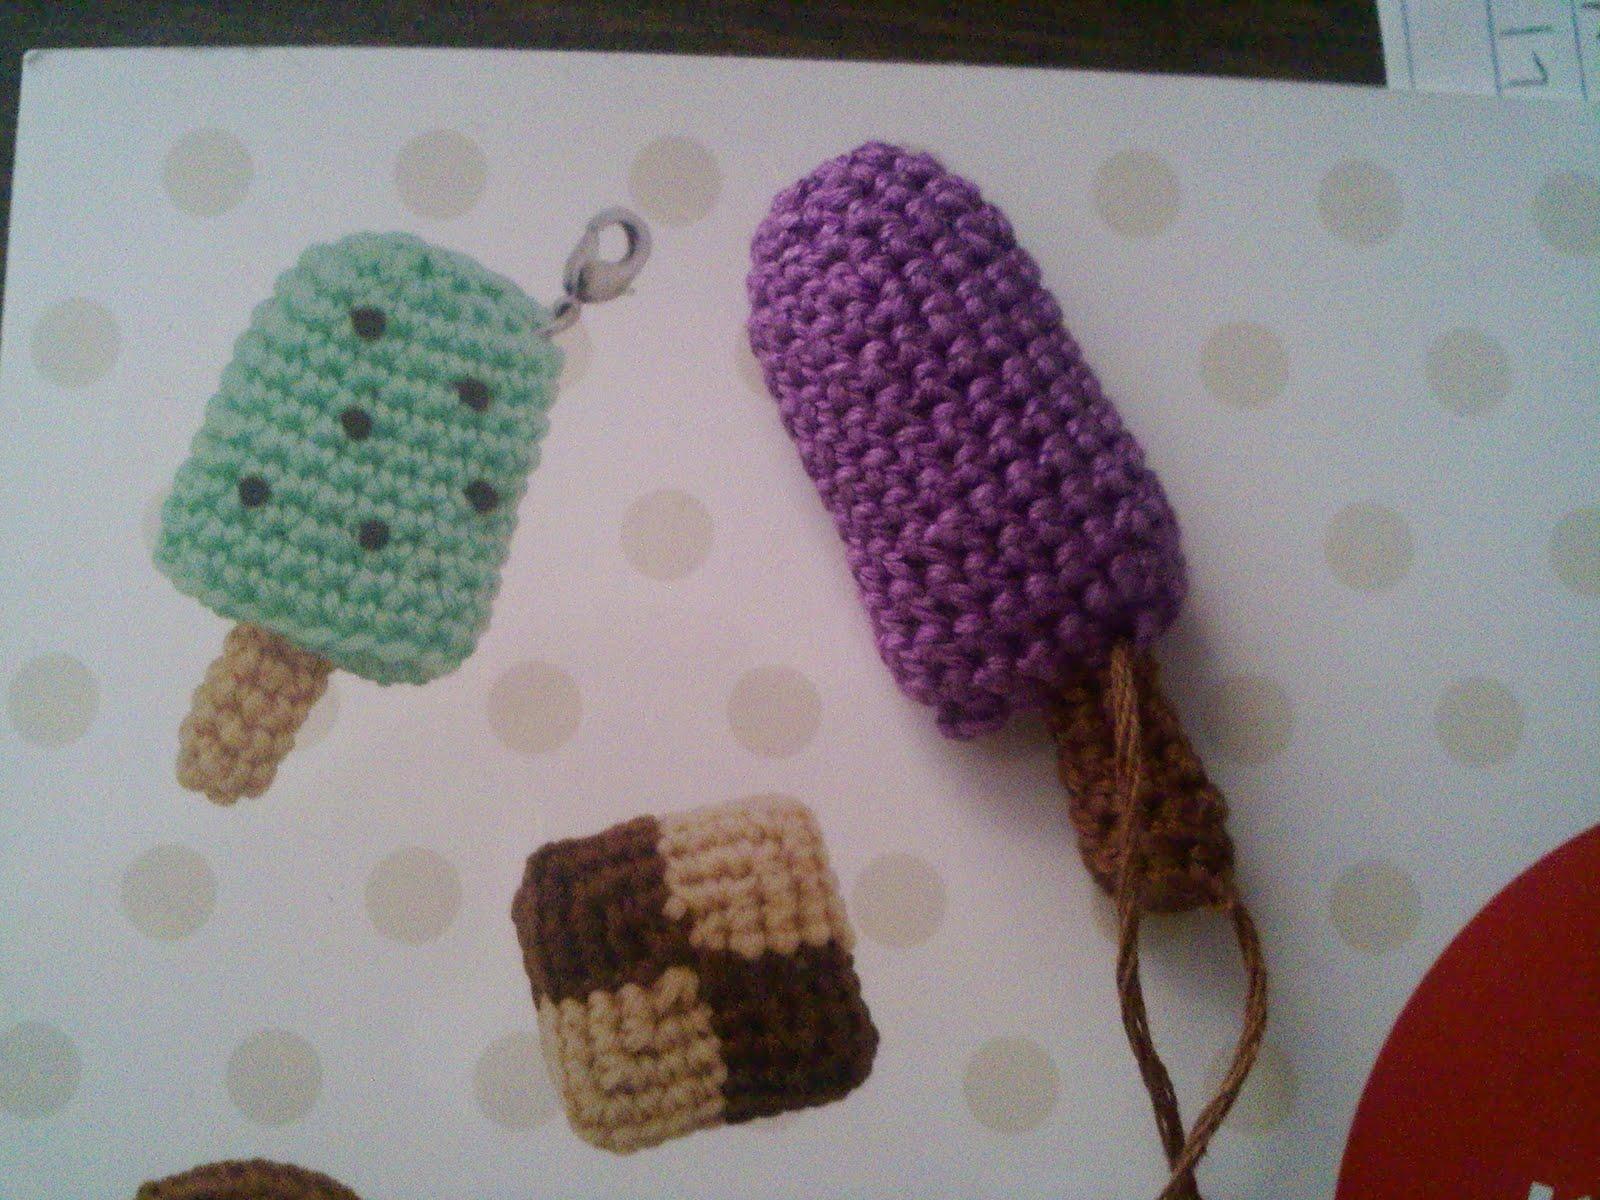 Crochet with embroidery floss makaroka